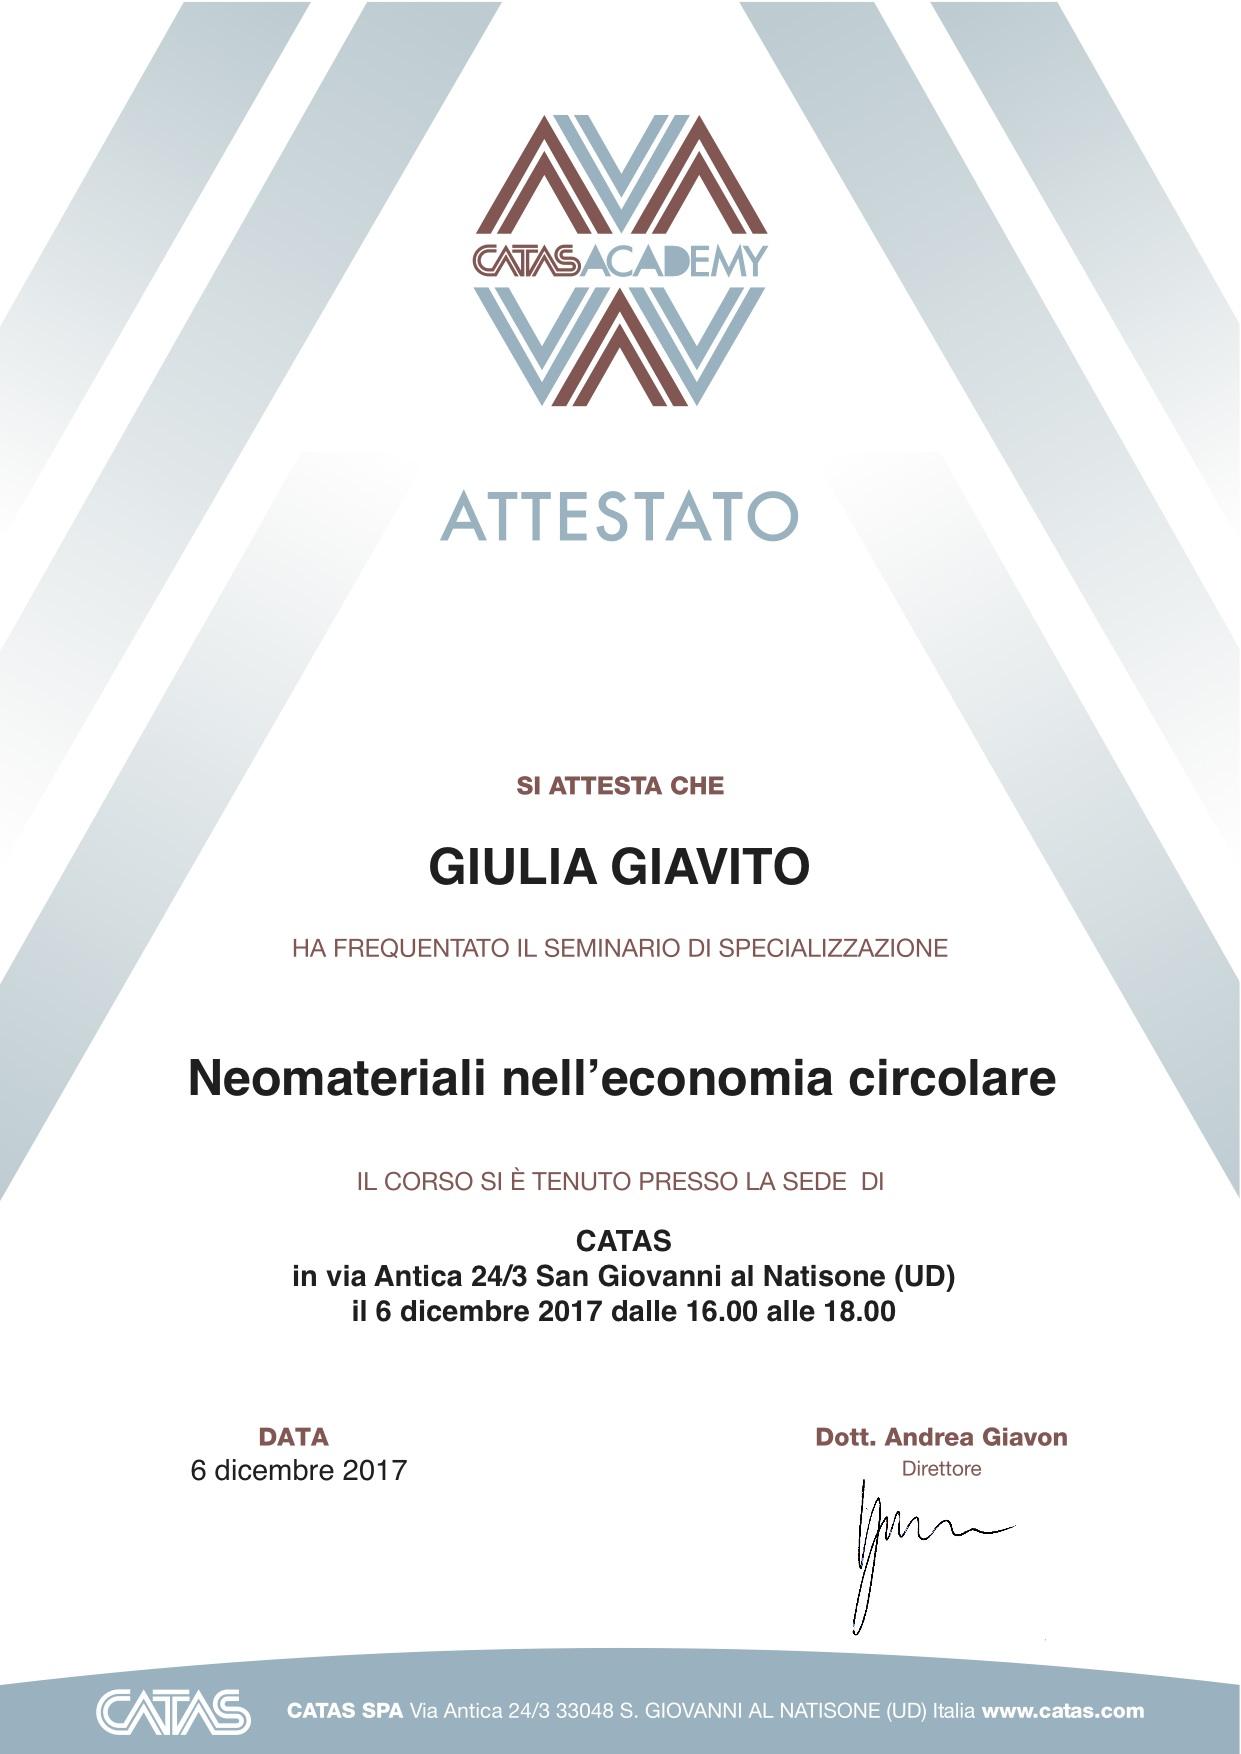 GIAVITO-1